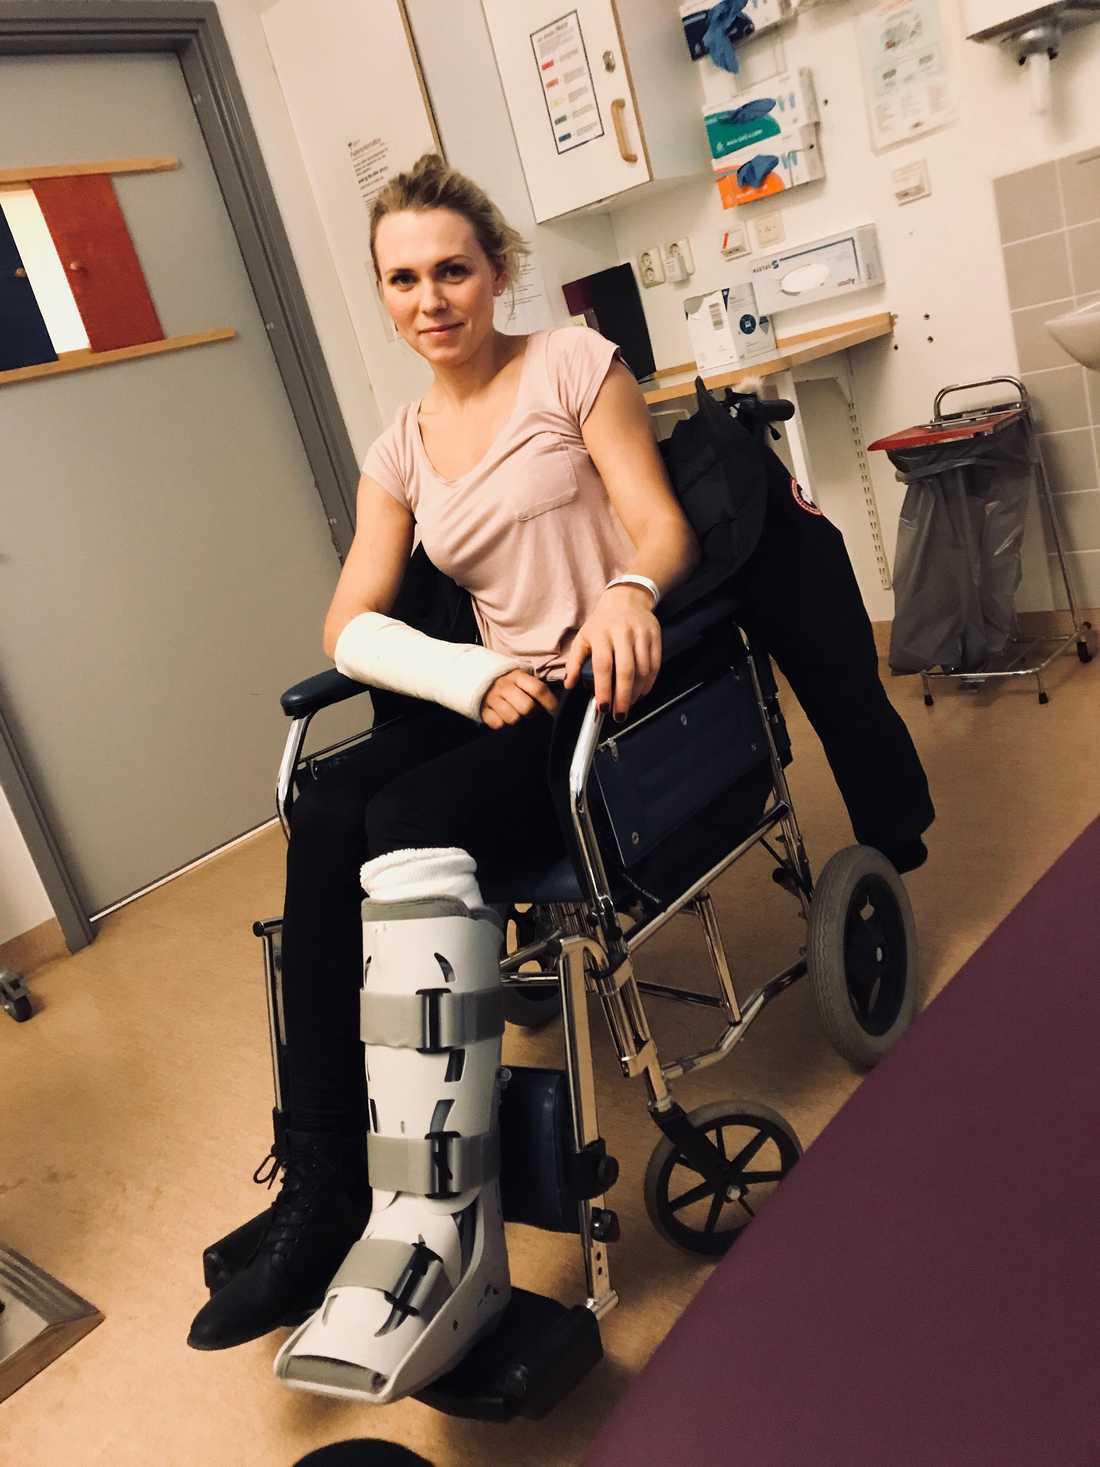 Josefine Ivehag på sjukhus en tid efter olyckan